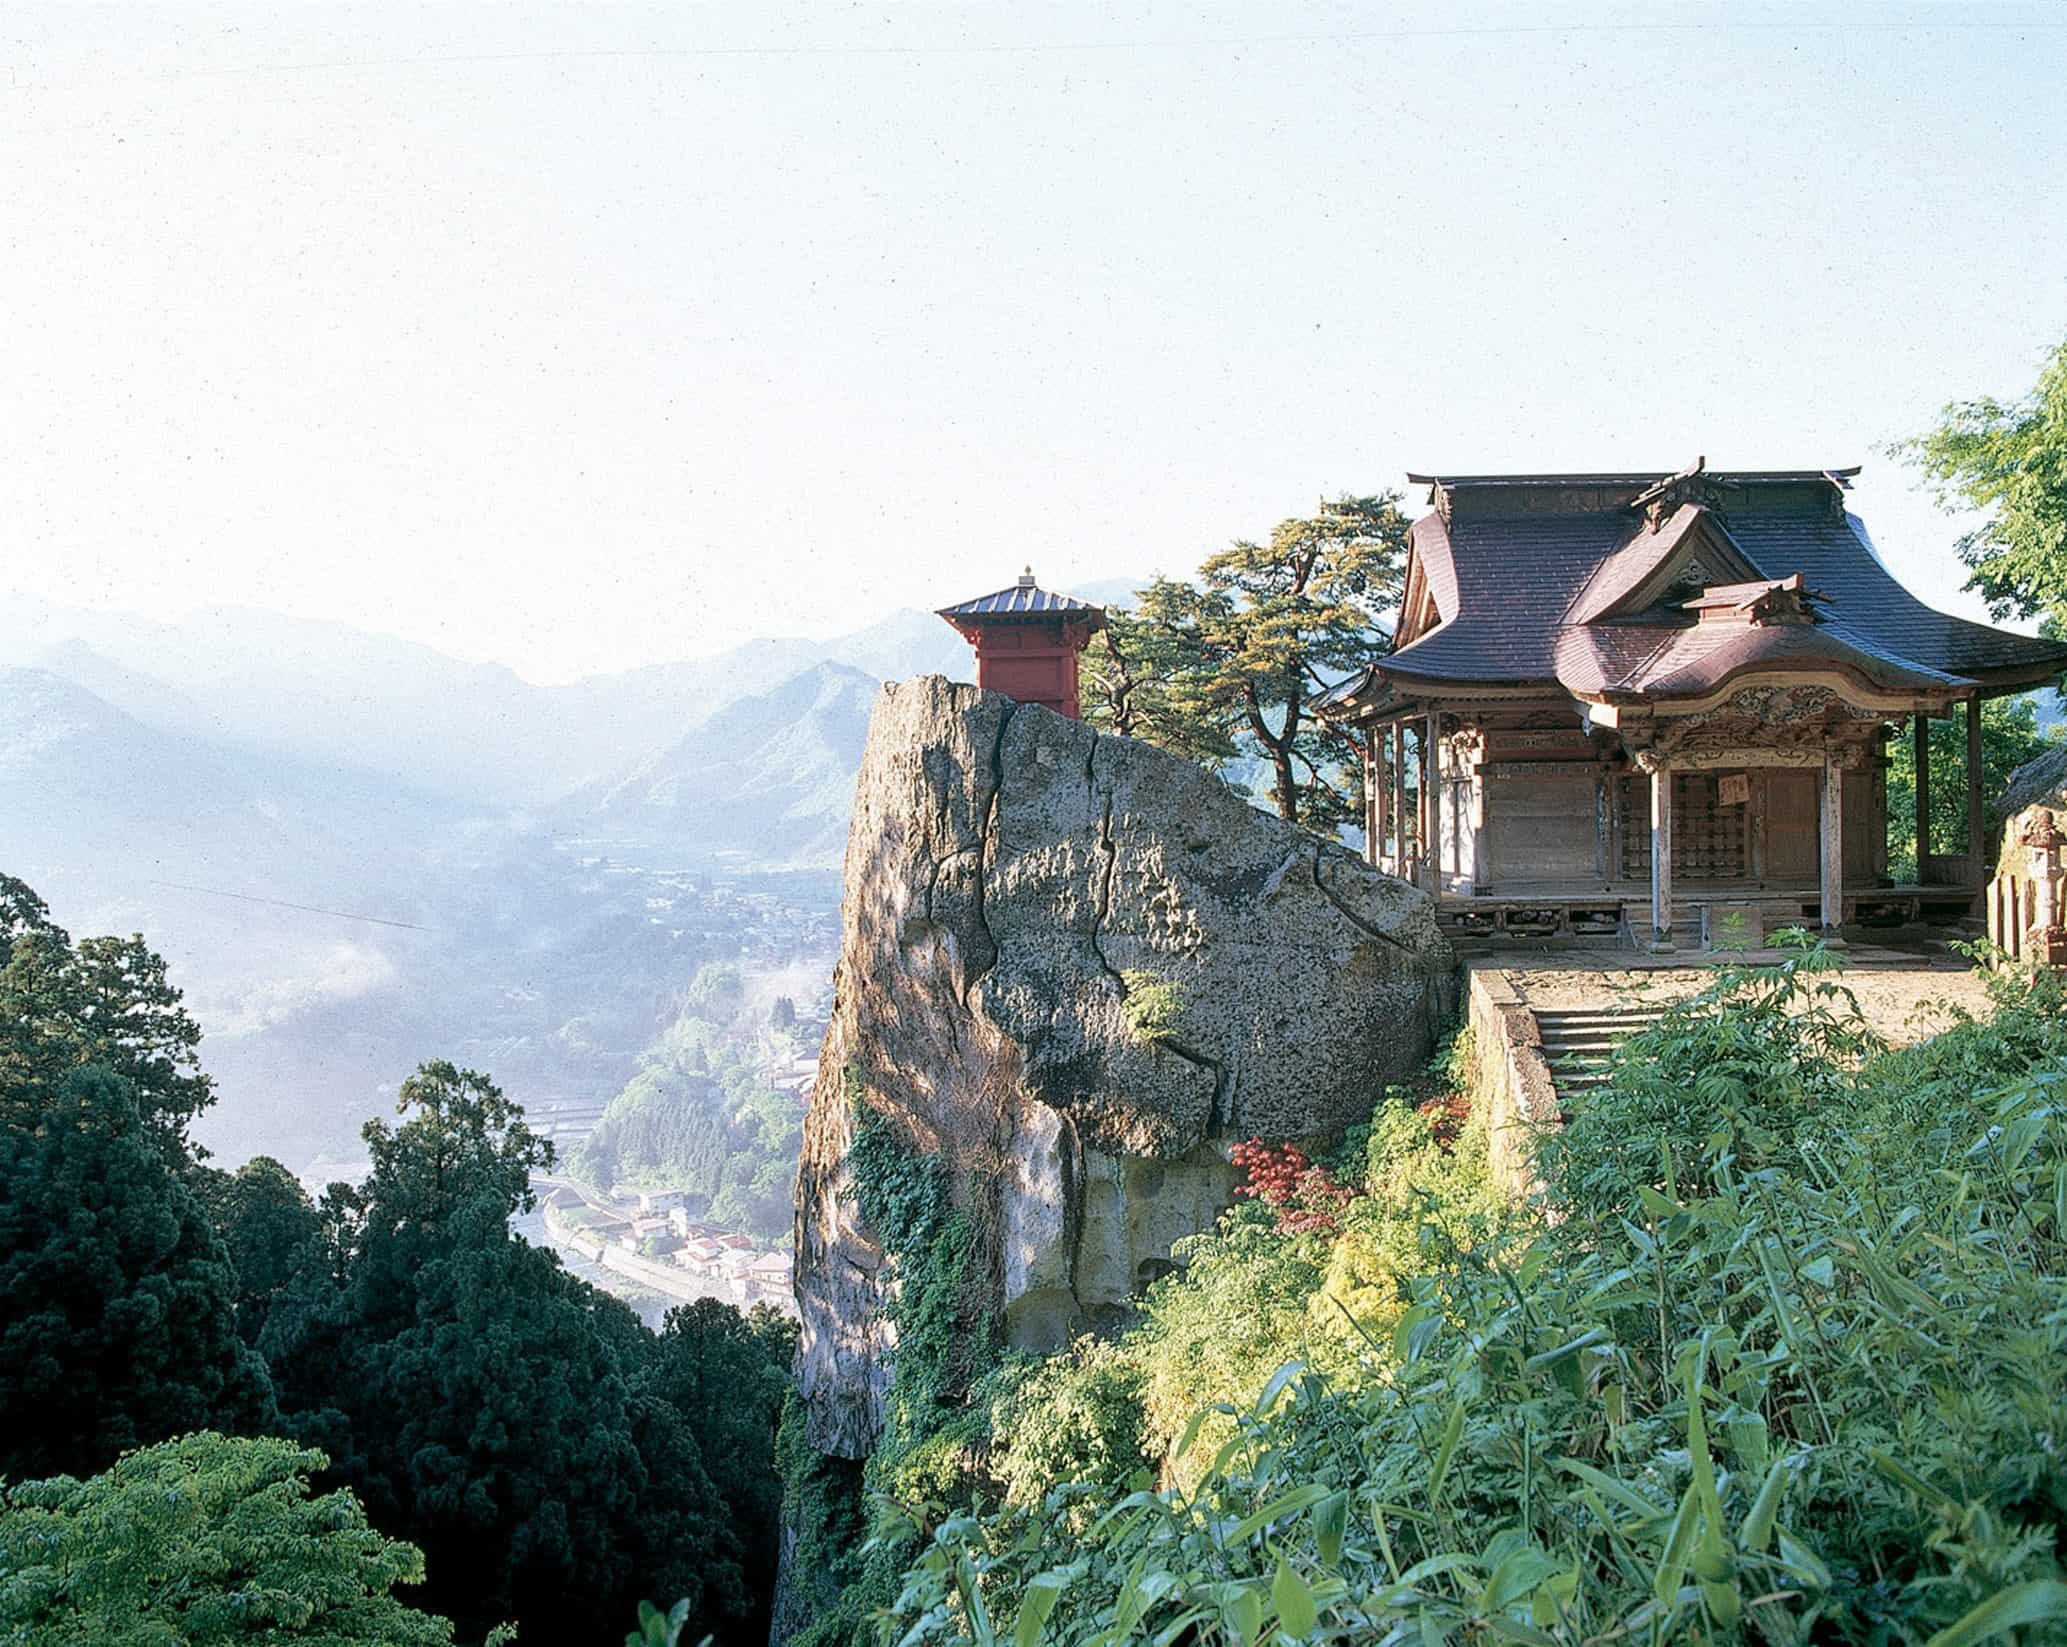 JR East Pass ยามากาตะ ฟุกุชิมะ และมิยากิ กับที่เที่ยวตามเส้นทางของรถไฟ Toreiyu Tsubasa - วัดยามาเดระ (Yamadera Temple) หรือ วัดริชชาคุจิ (Risshakuji Temple)